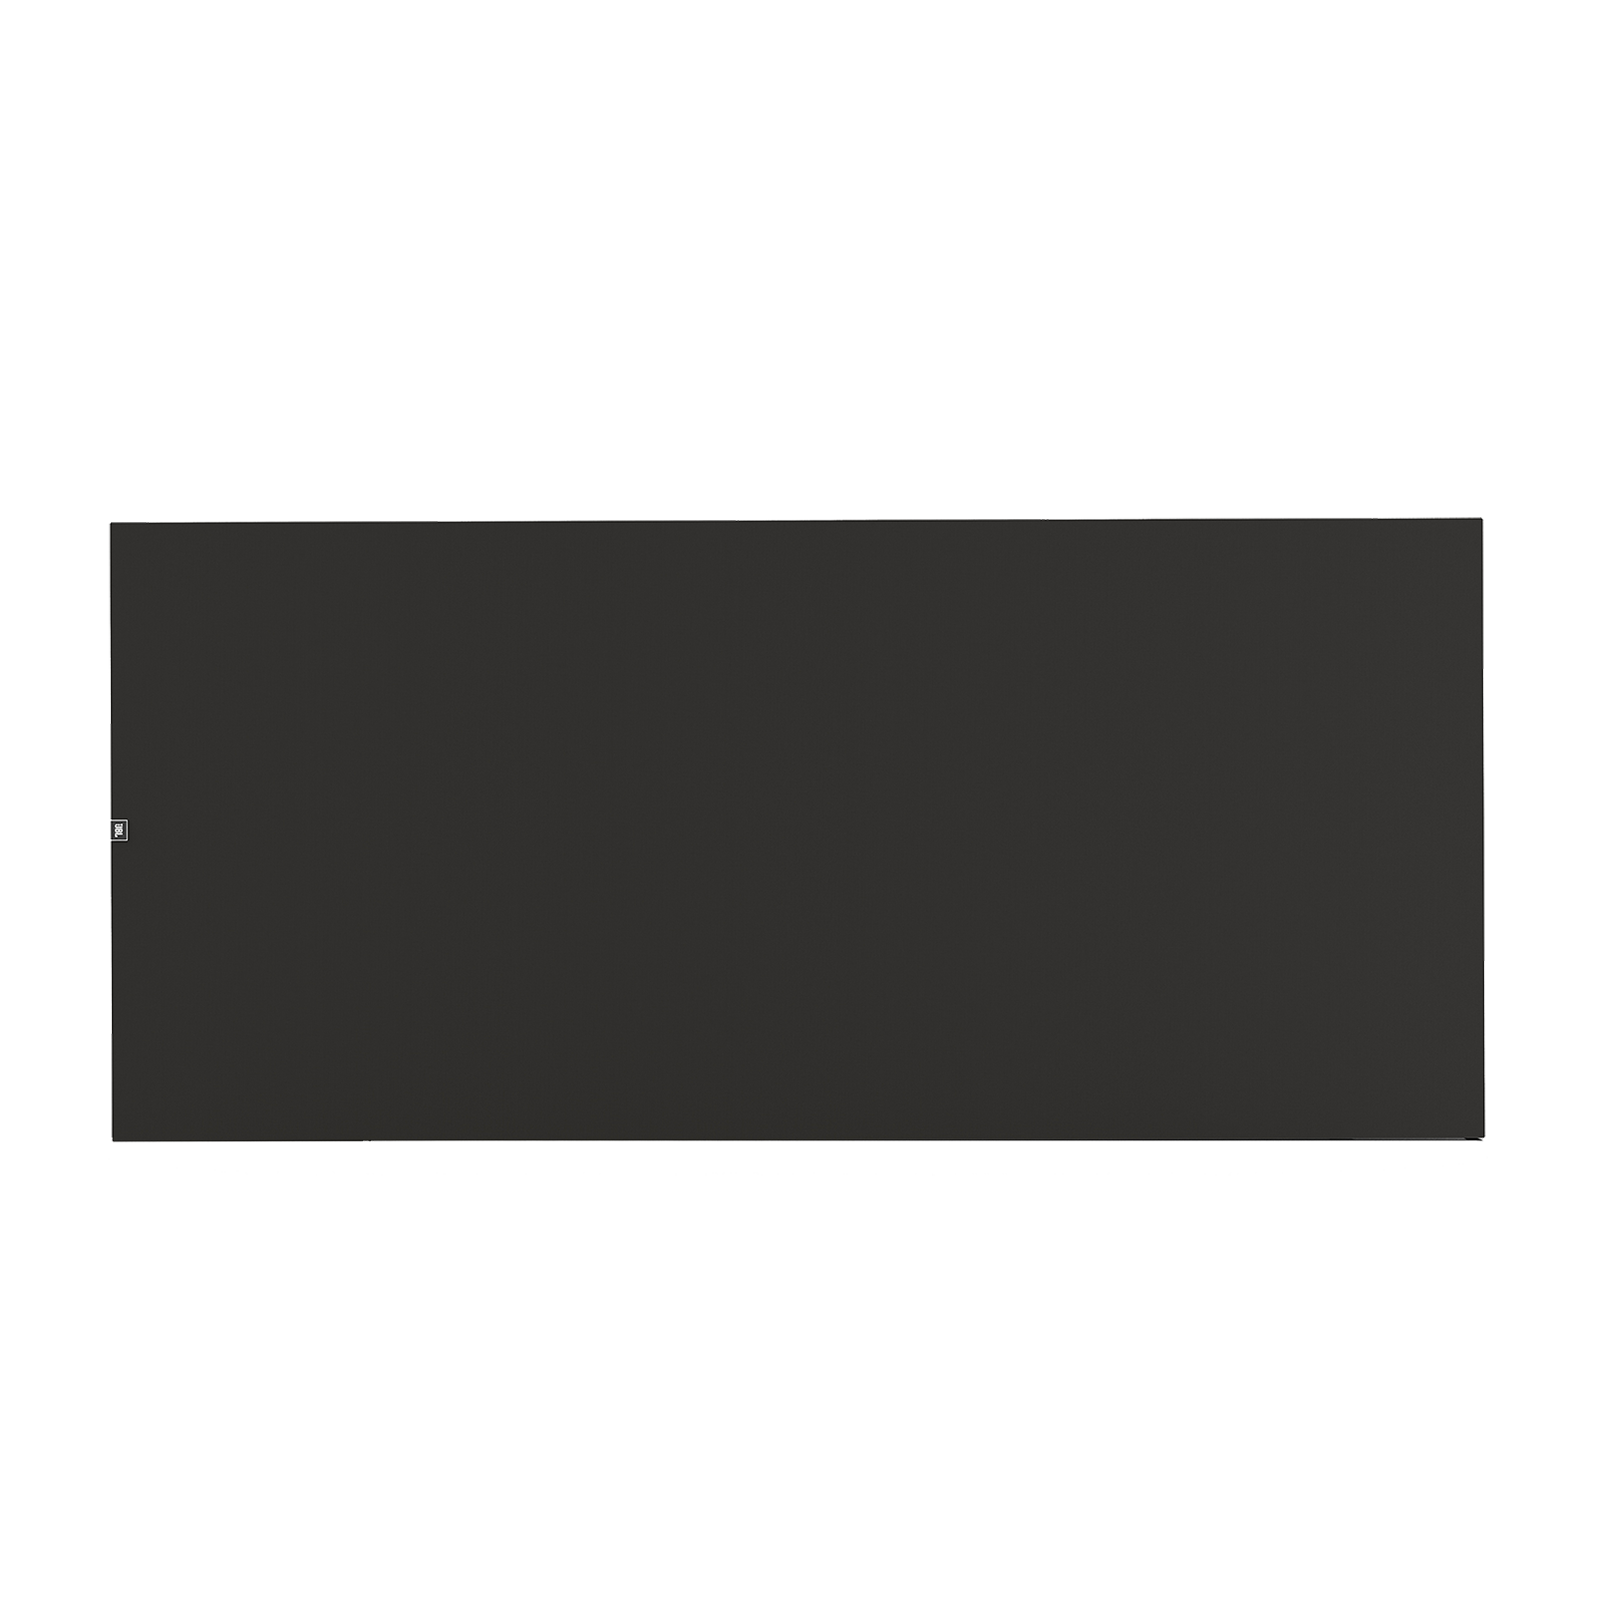 SSW-1 - Black - Dual 15-inch (380mm) Passive Subwoofer - Detailshot 1